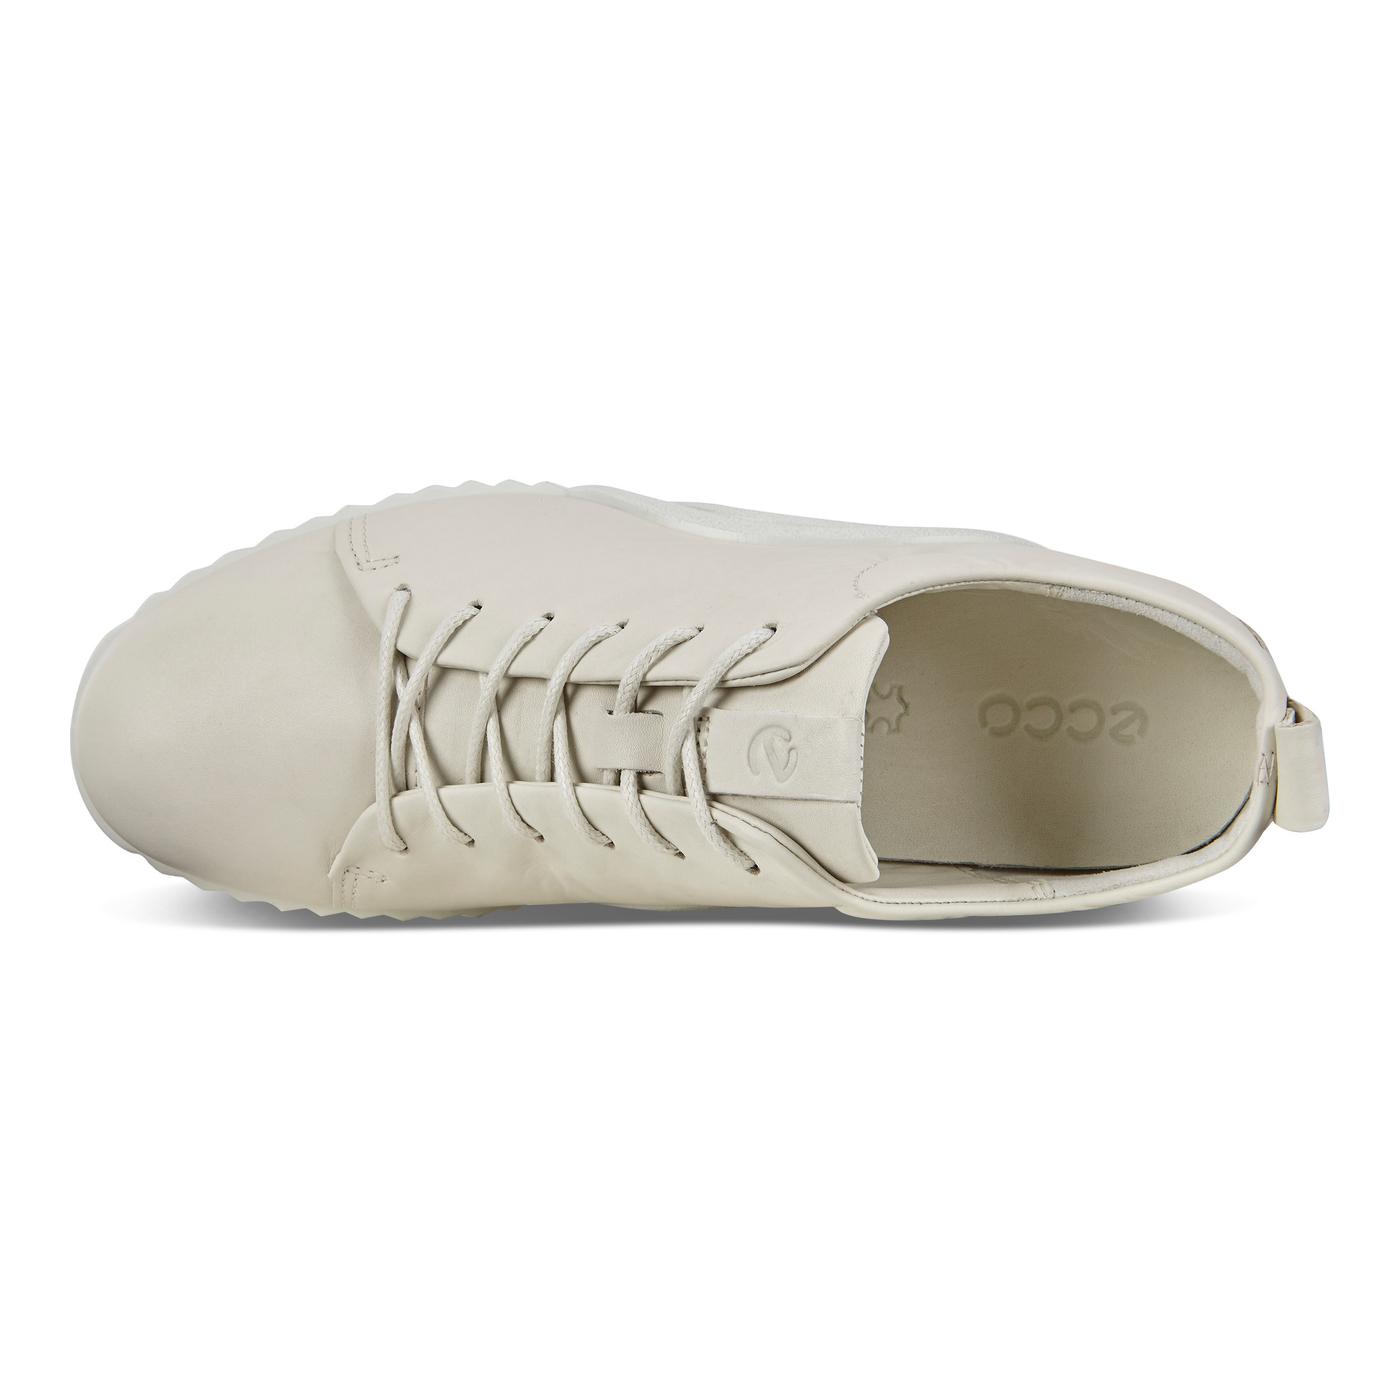 ECCO VIBRATION 1.0 Shoe